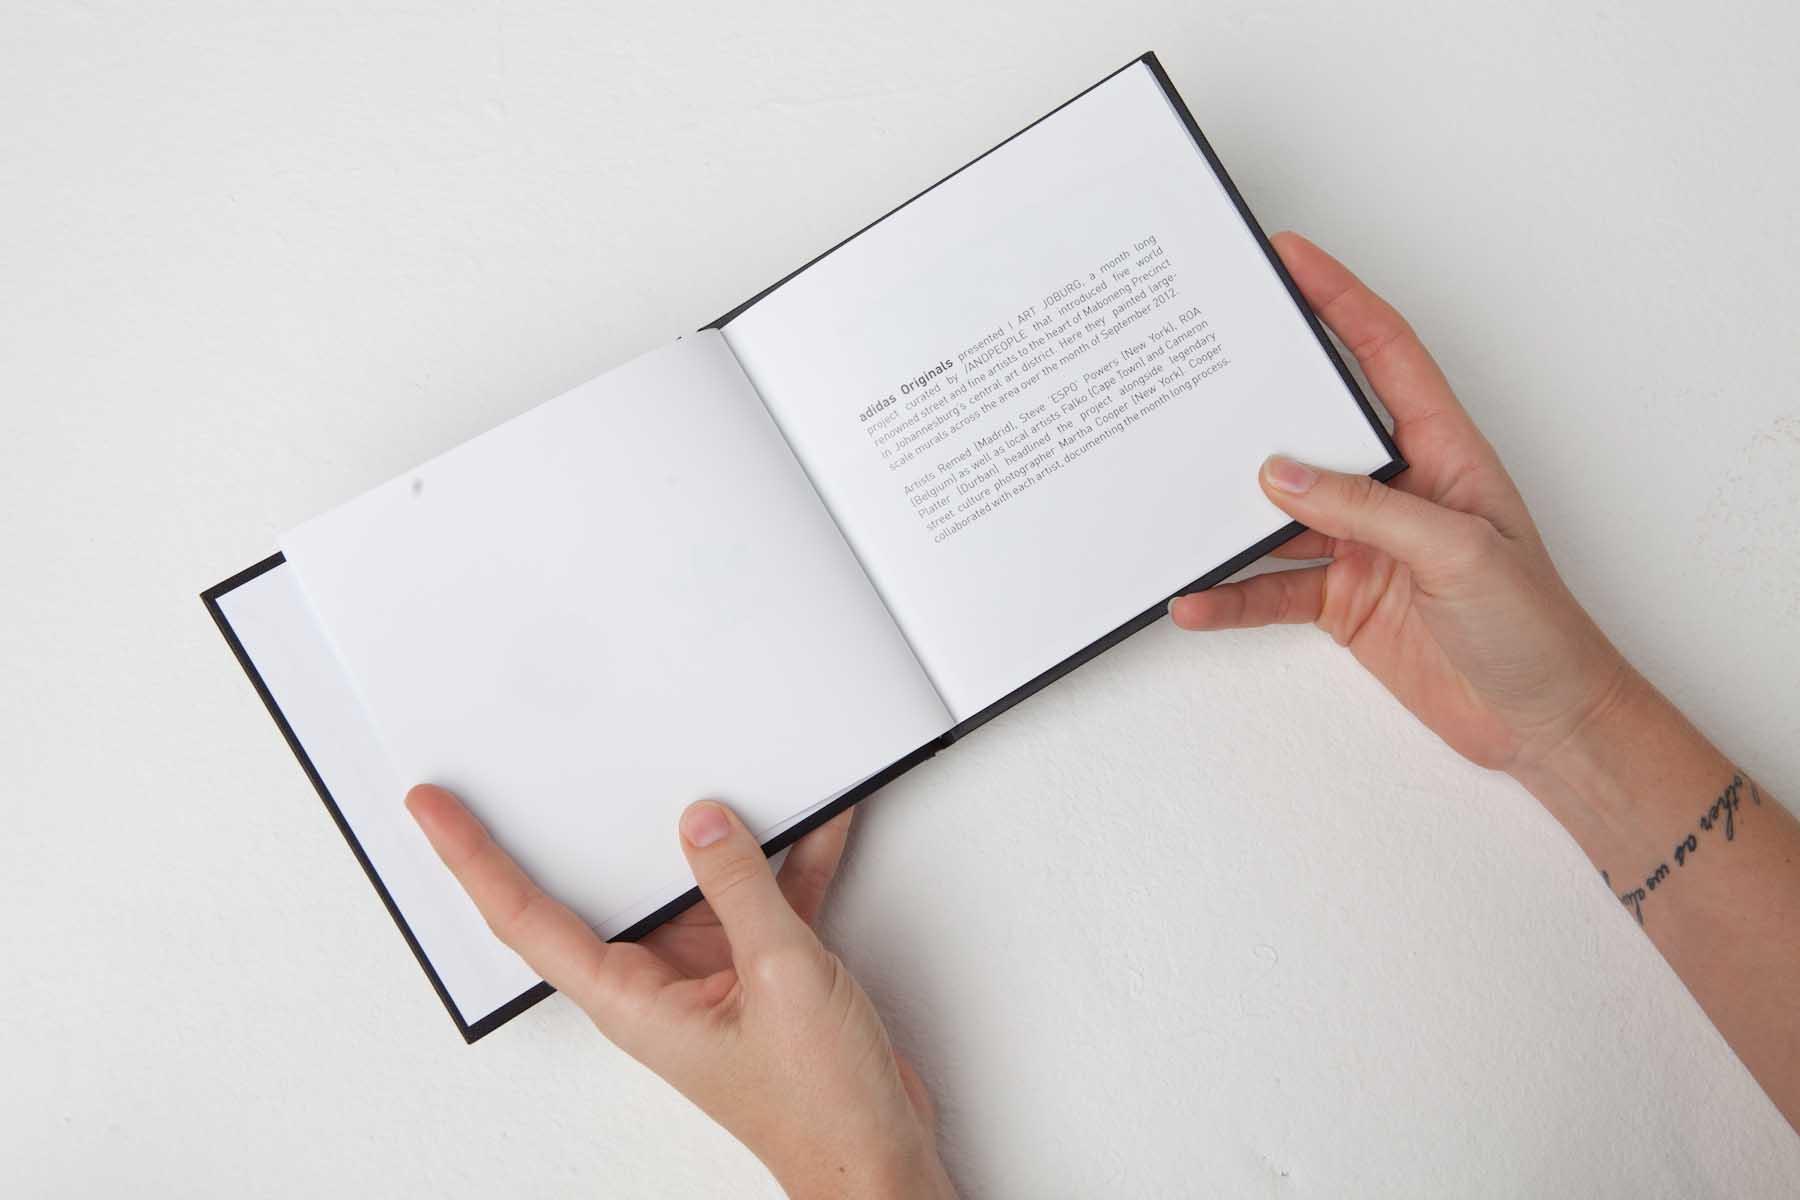 ADIDAS_IART JOBURG_KimTerriSmith_Book_04.jpg